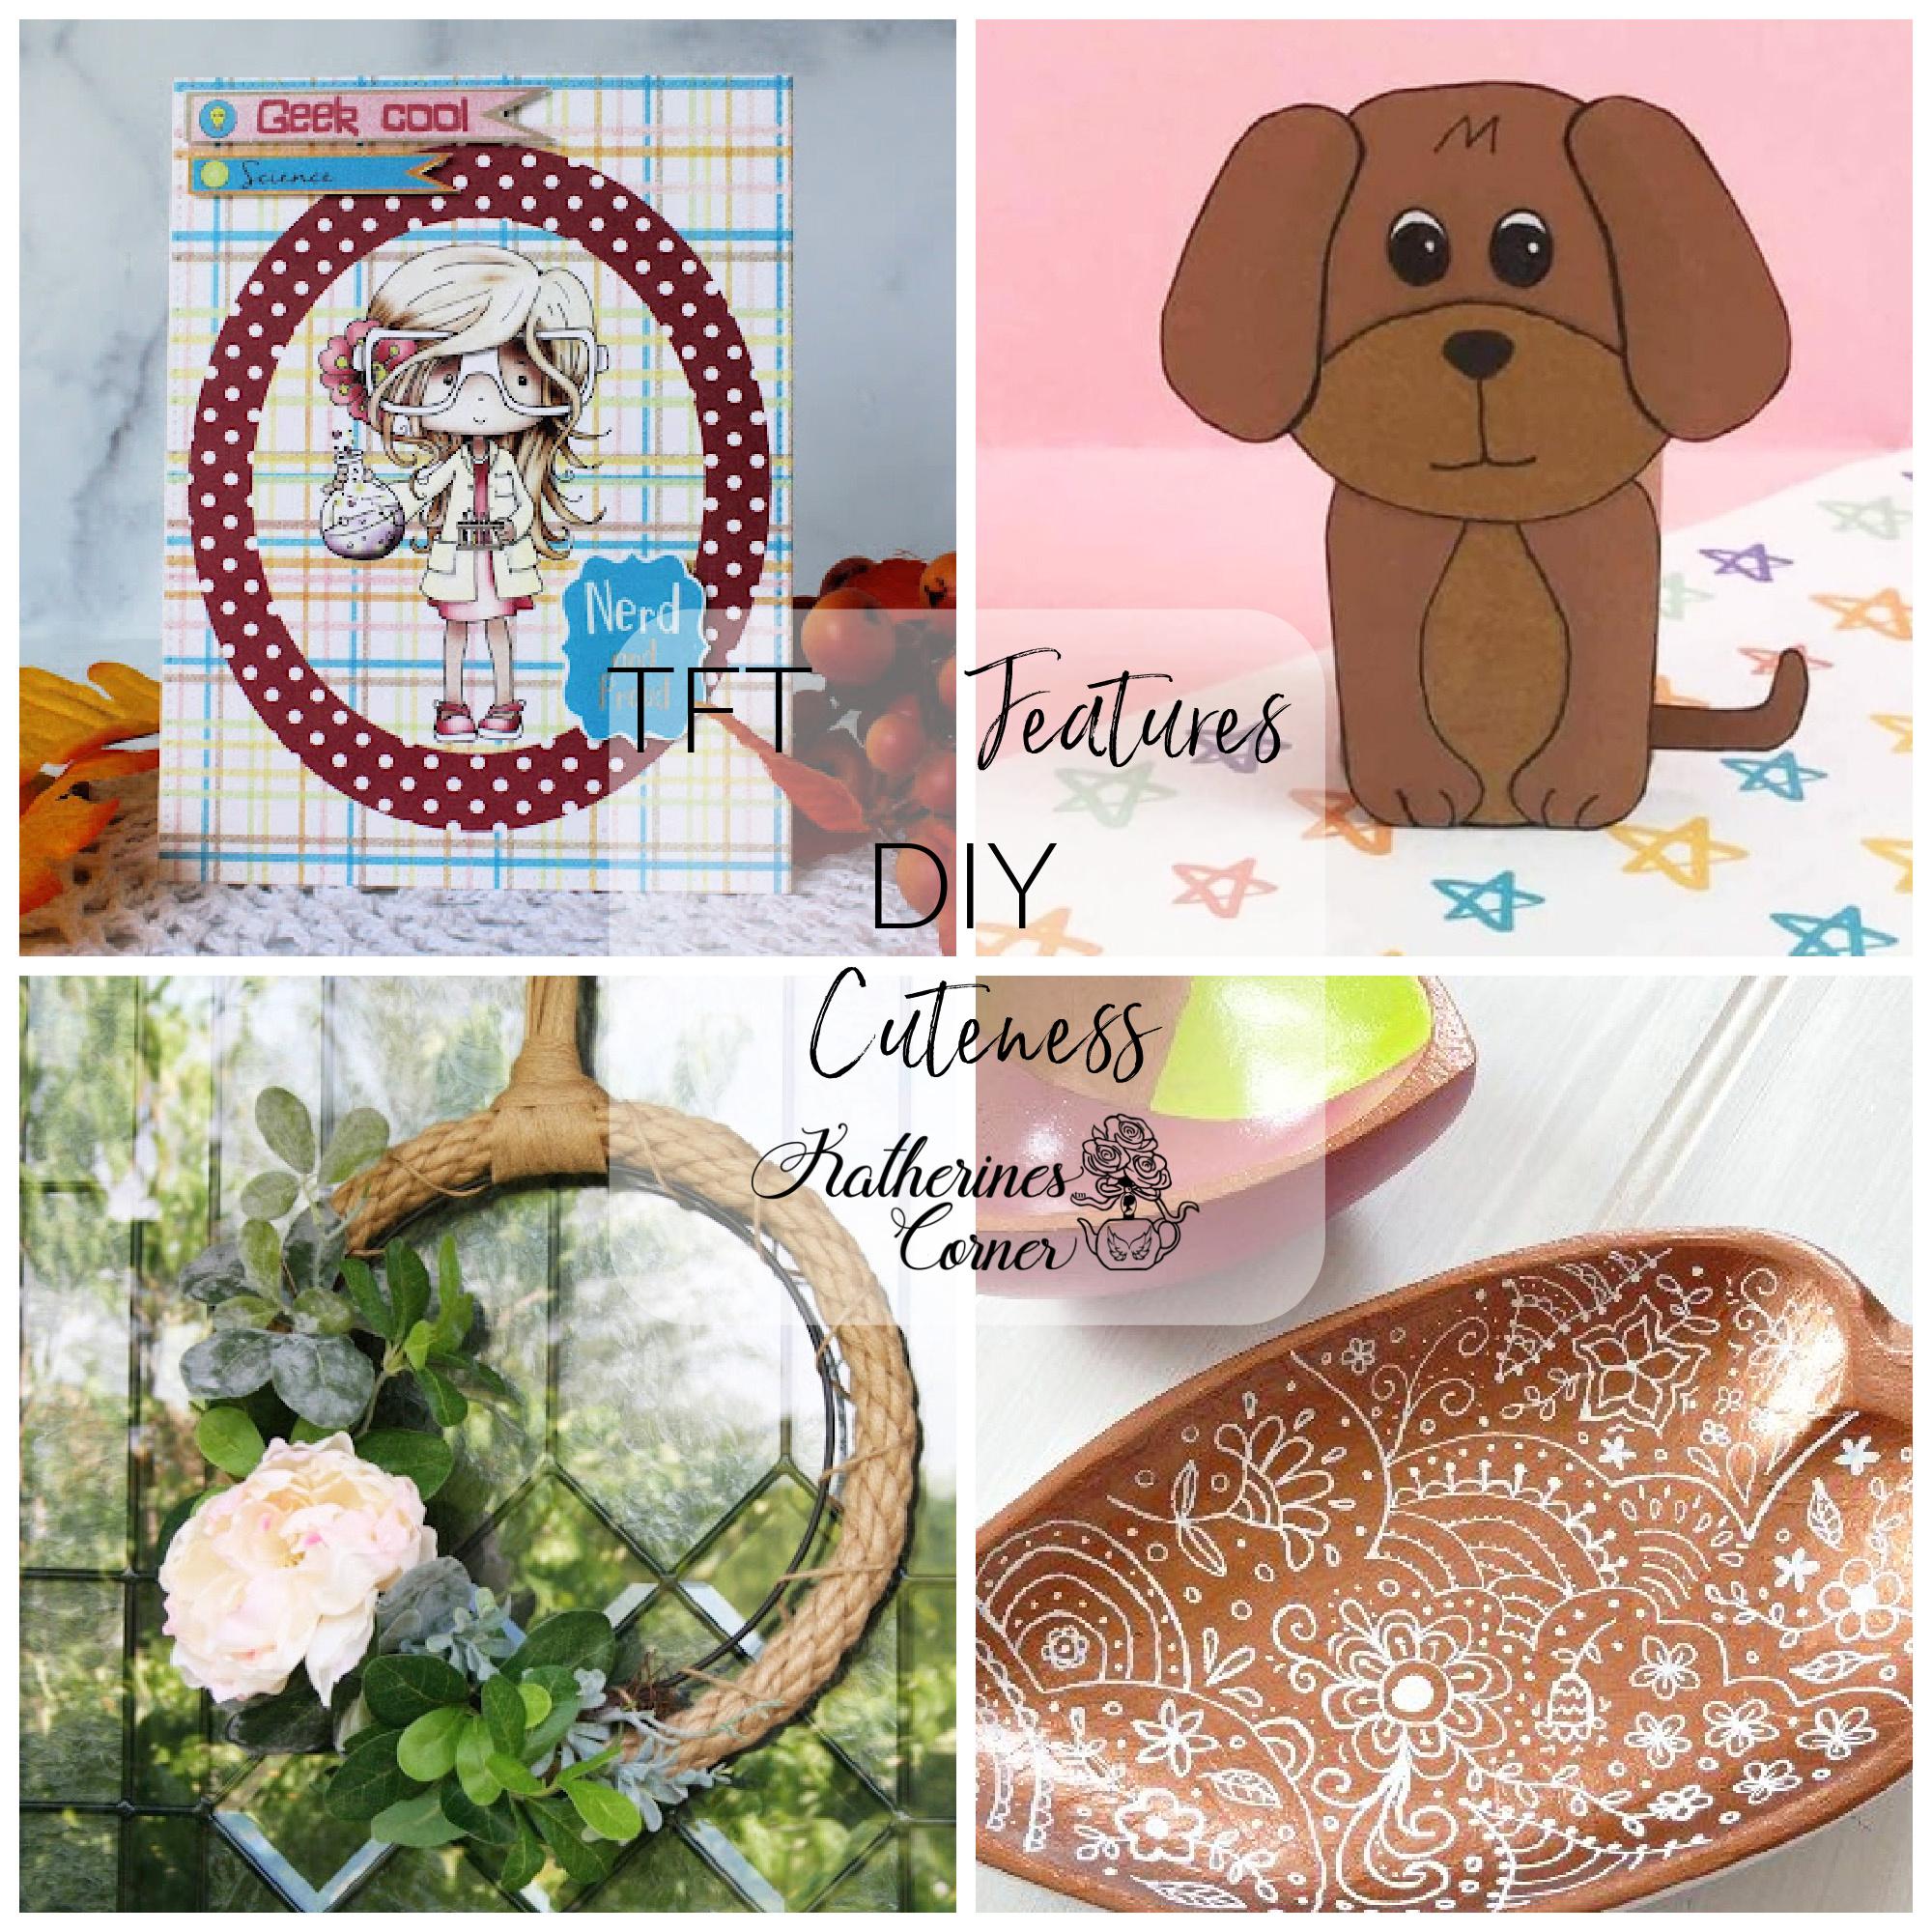 DIY Cuteness and TFT Blog Hop